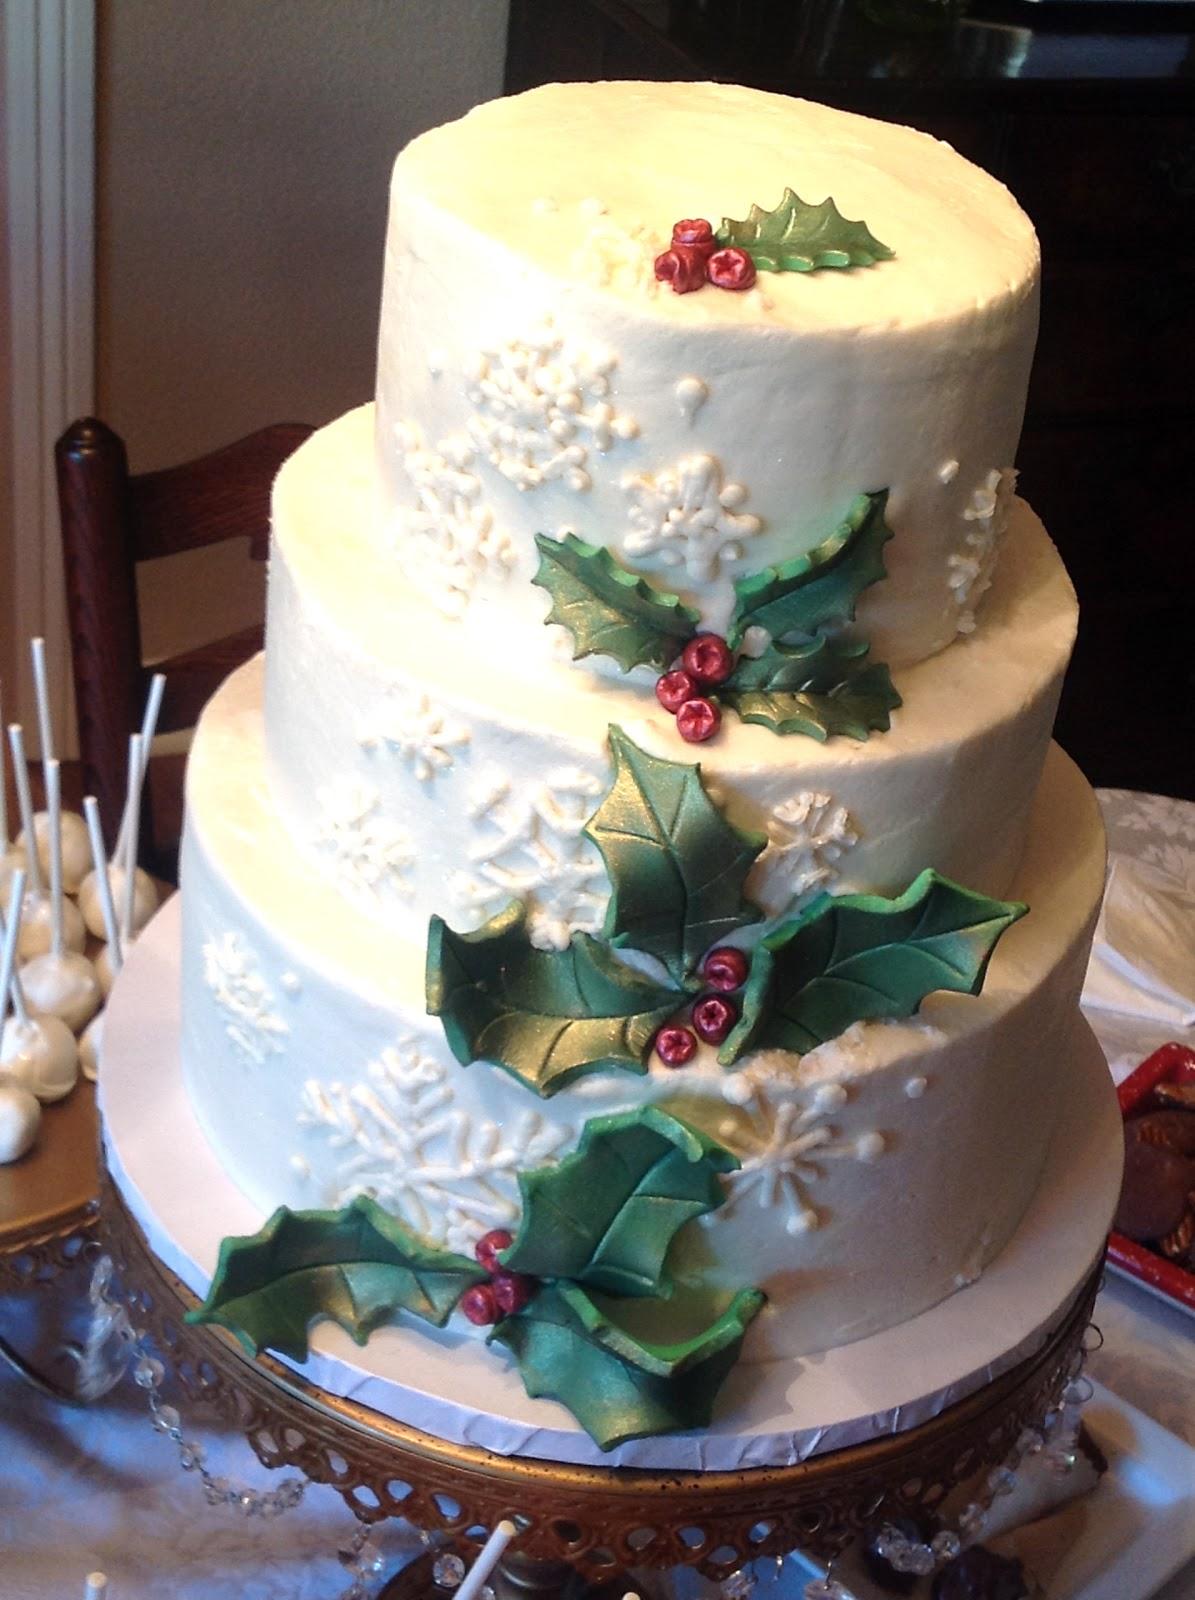 Plumeria Cake Studio: Winter Holly Wedding Cake  Plumeria Cake S...